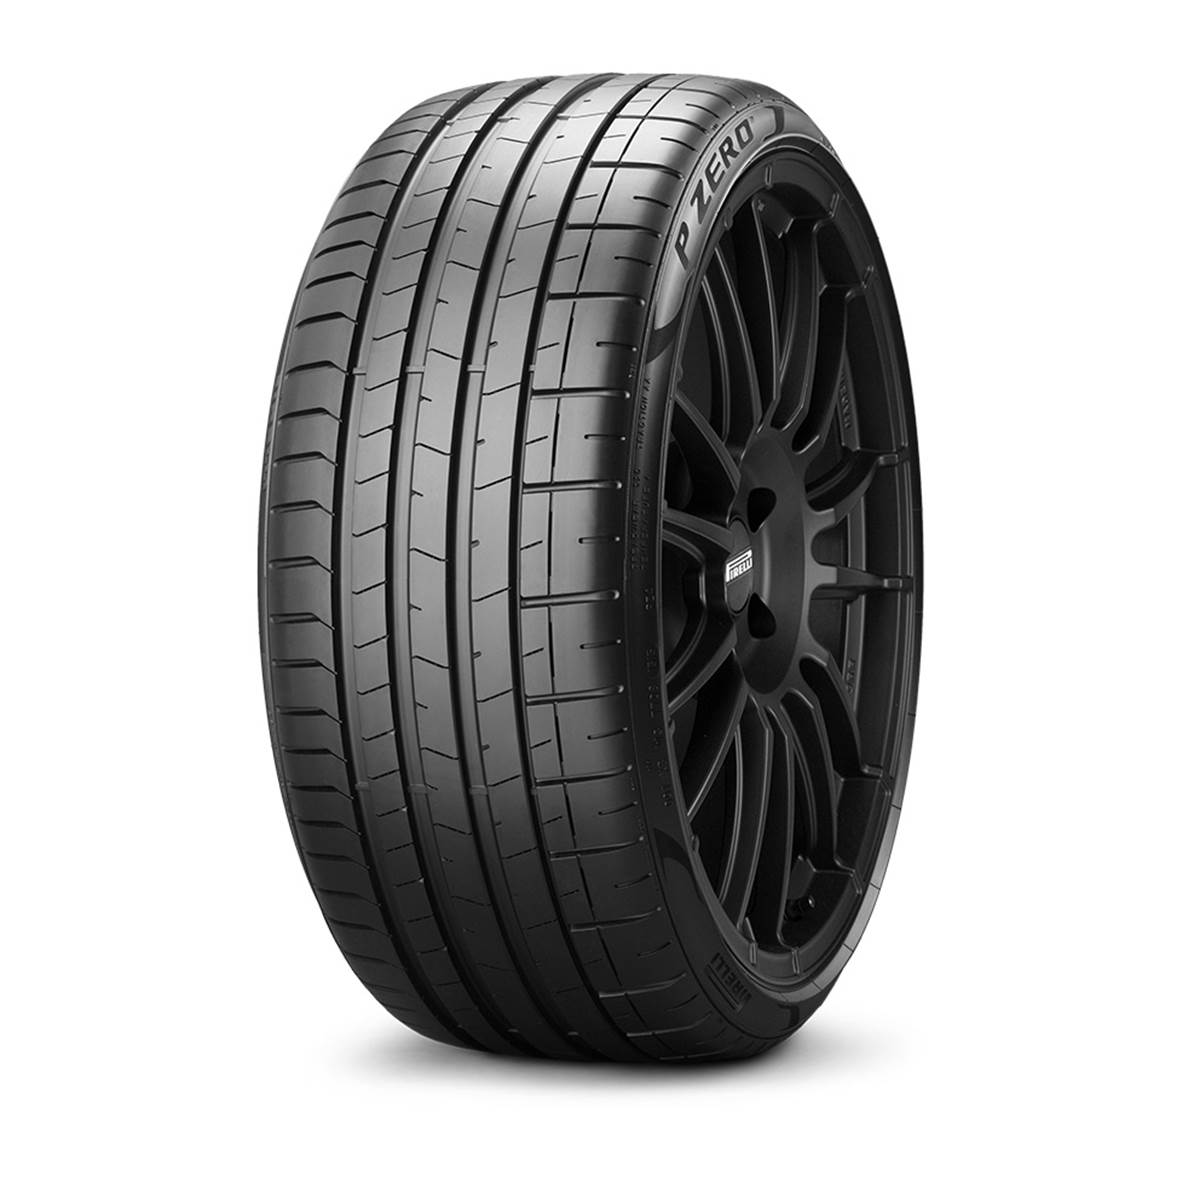 Pneu Pirelli 225/45R18 91W Pzero